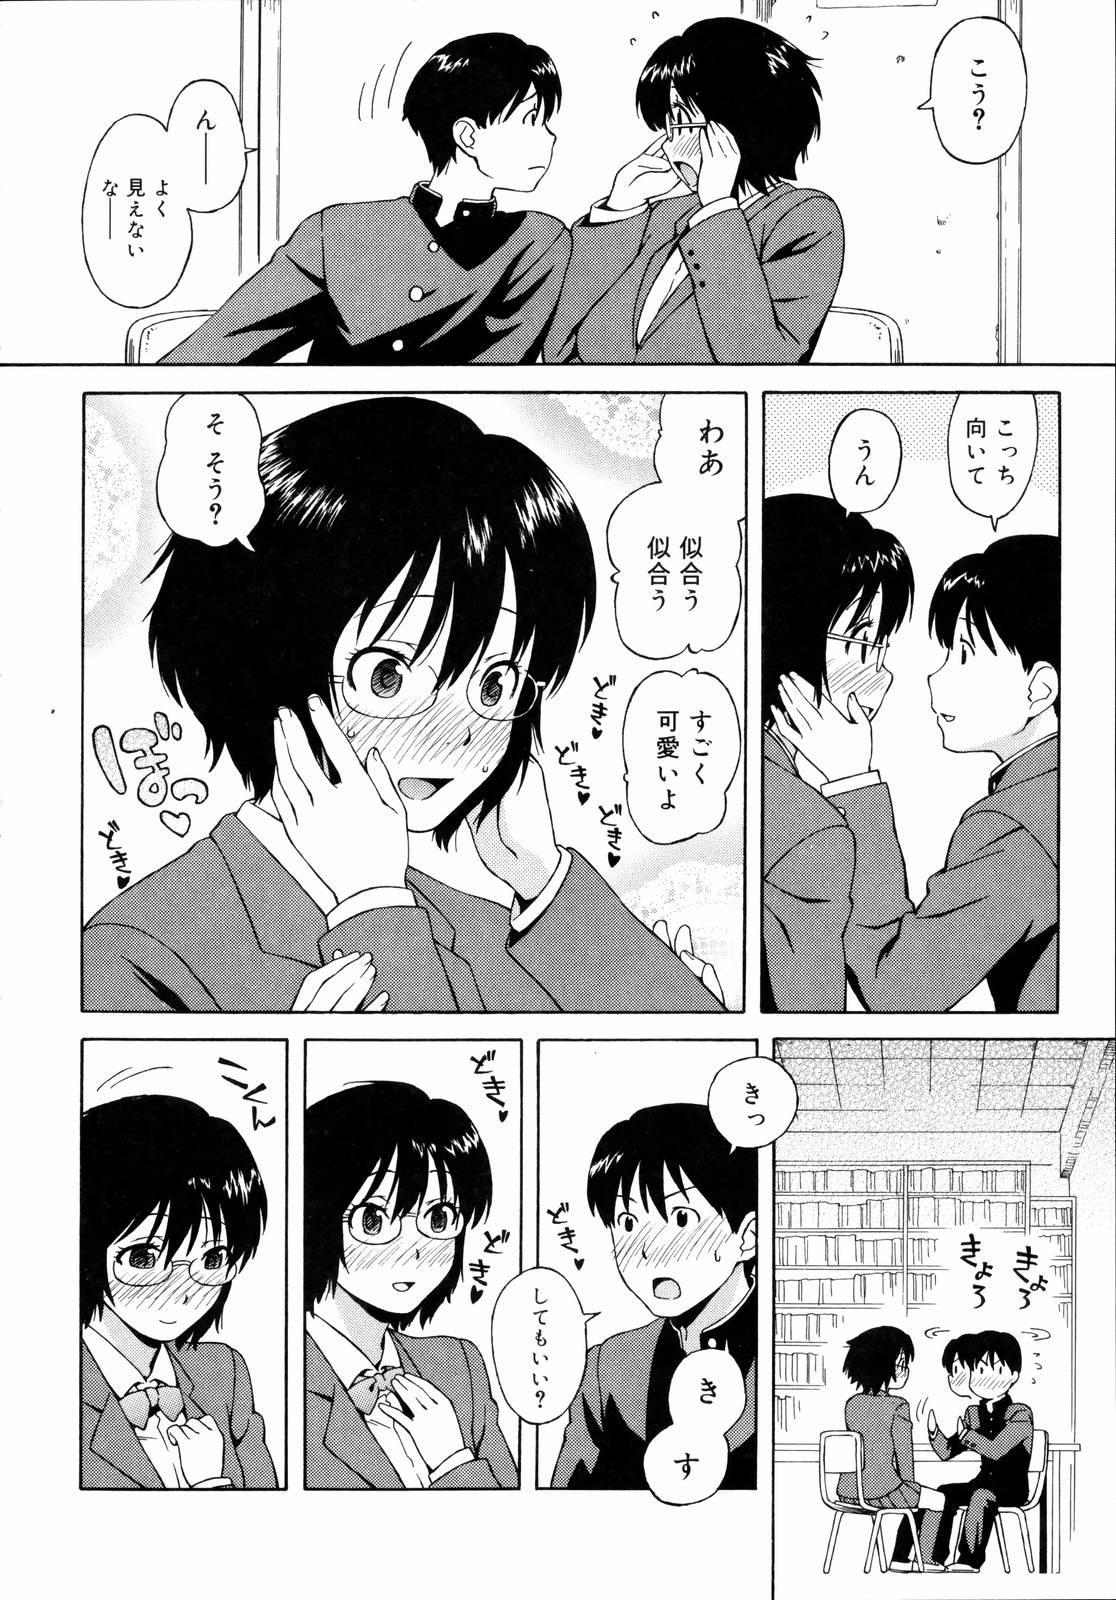 Shishunki wa Hatsujouki - Adolescence is a sexual excitement period. 29